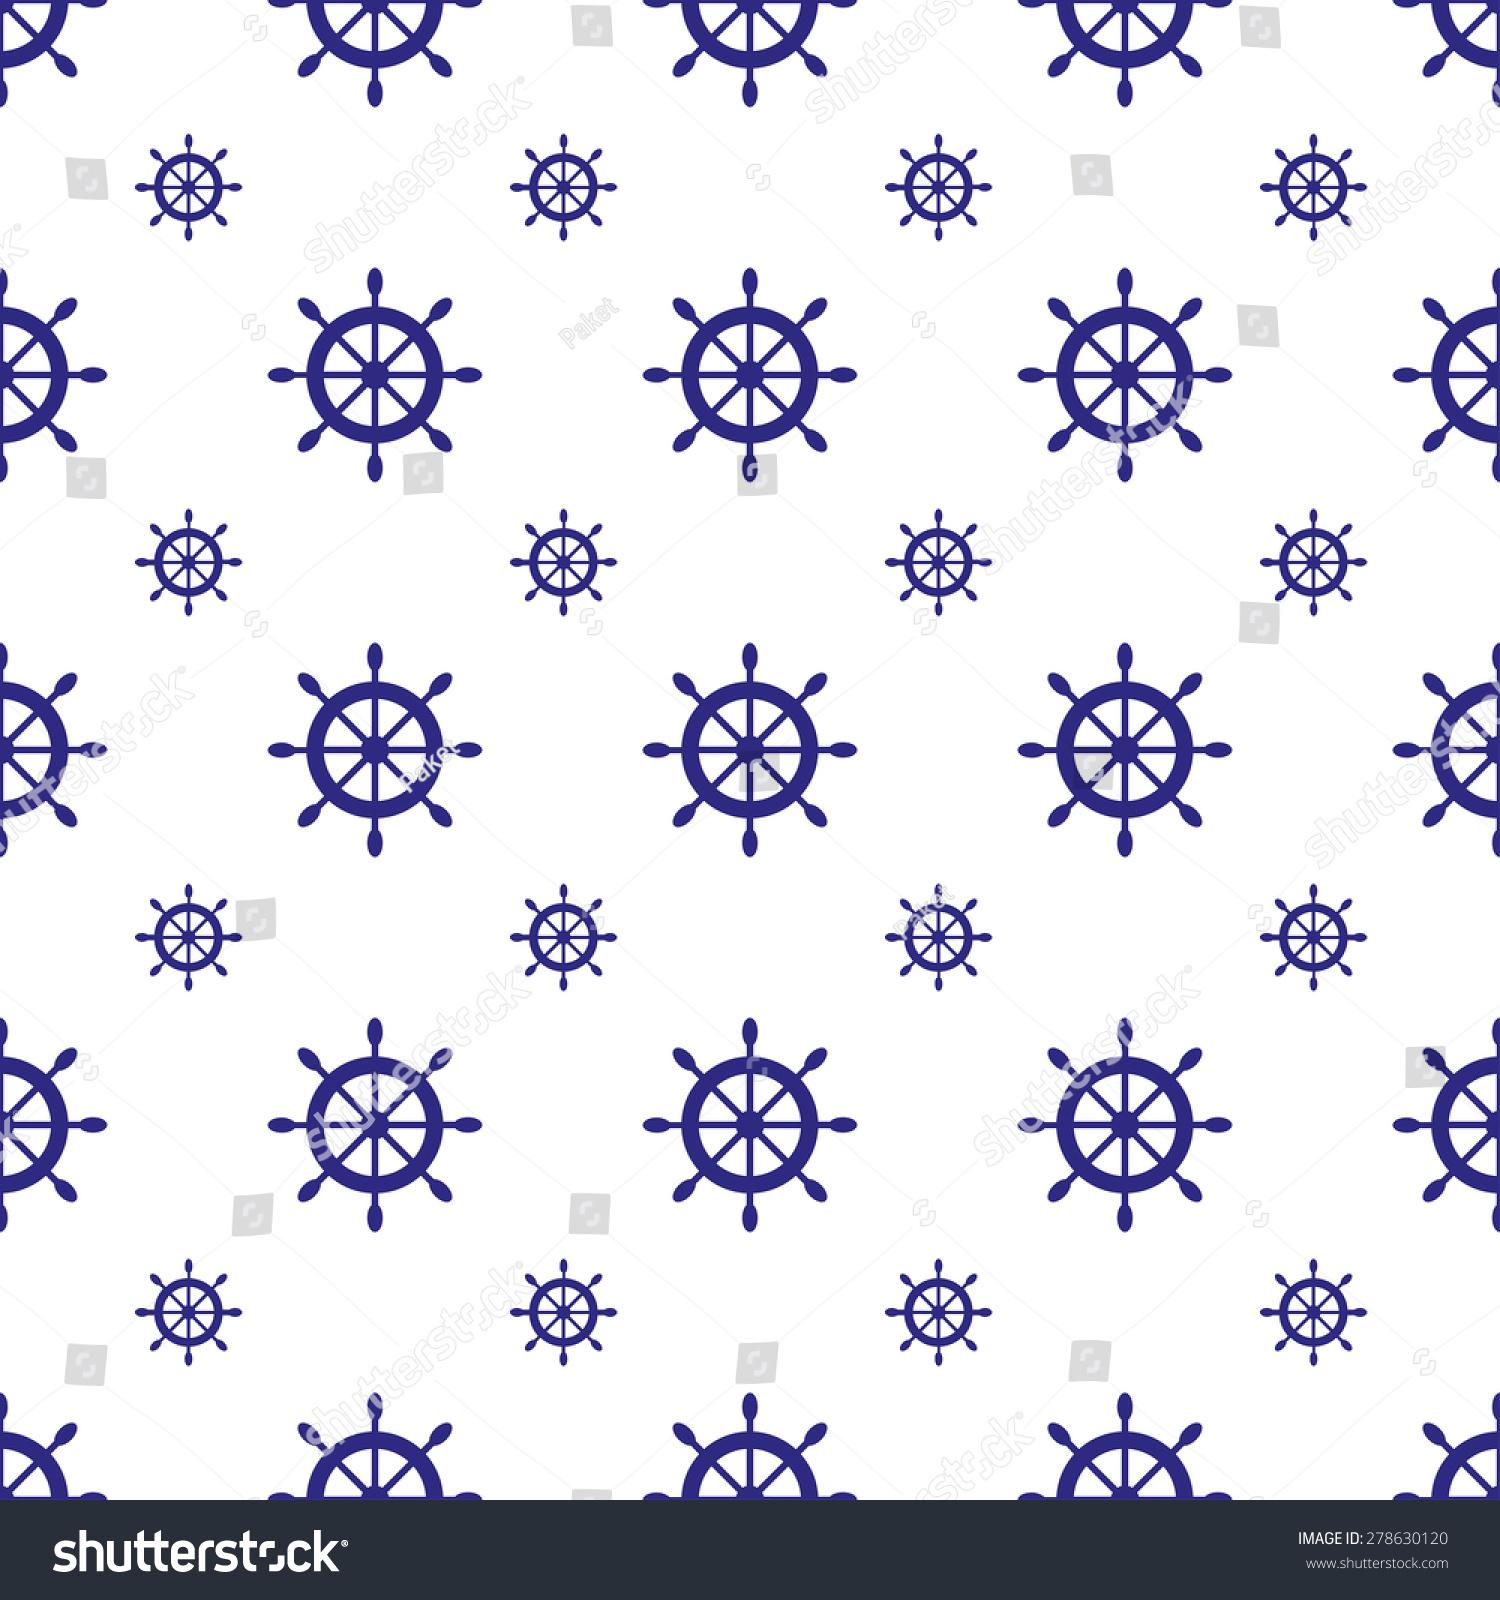 Seamless Nautical Pattern Ship Wheels Design Stock Vector